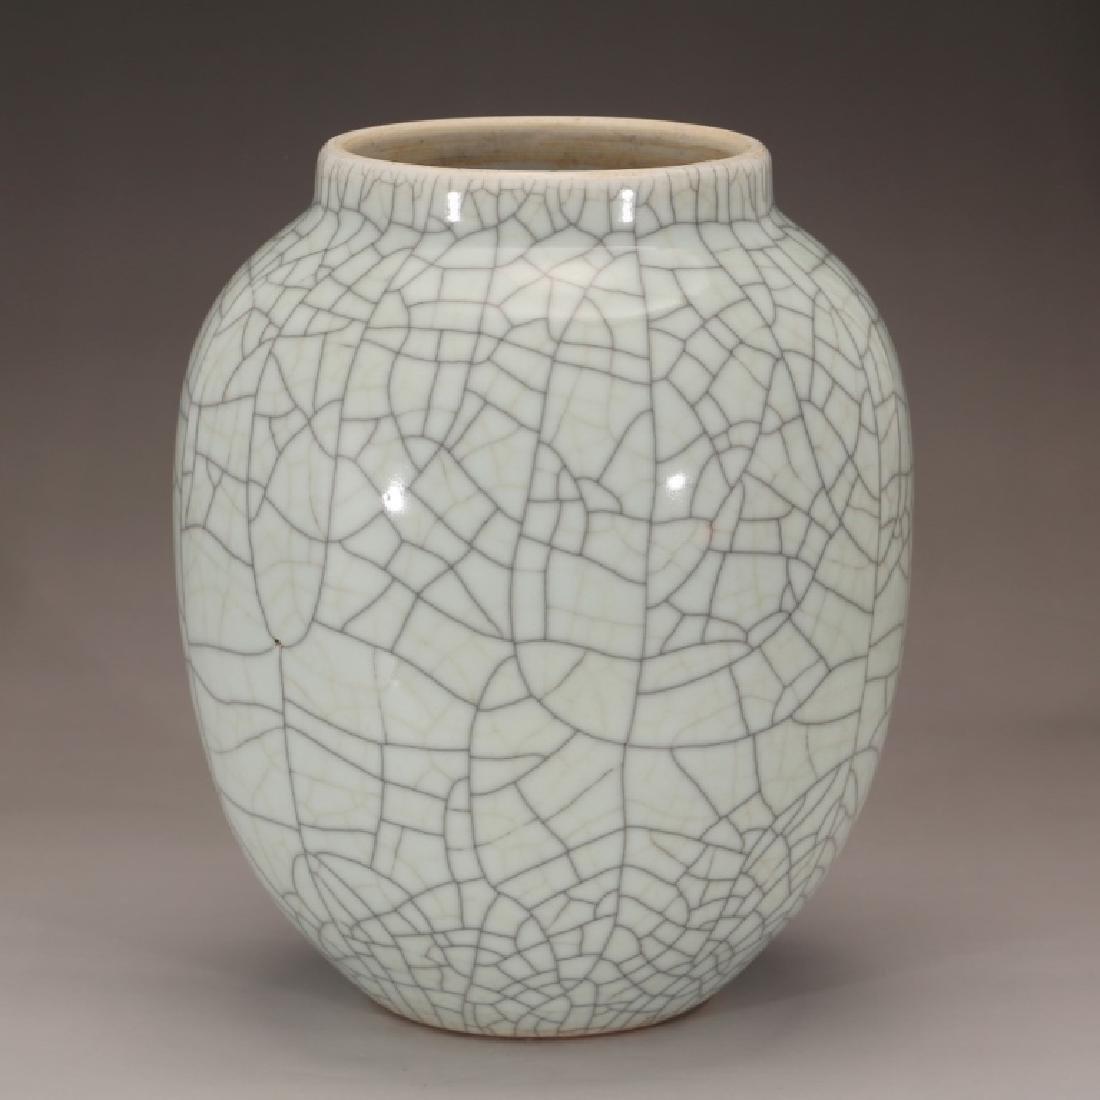 Chinese 19 C Guanyao Crackle Glaze Porcelain Jar